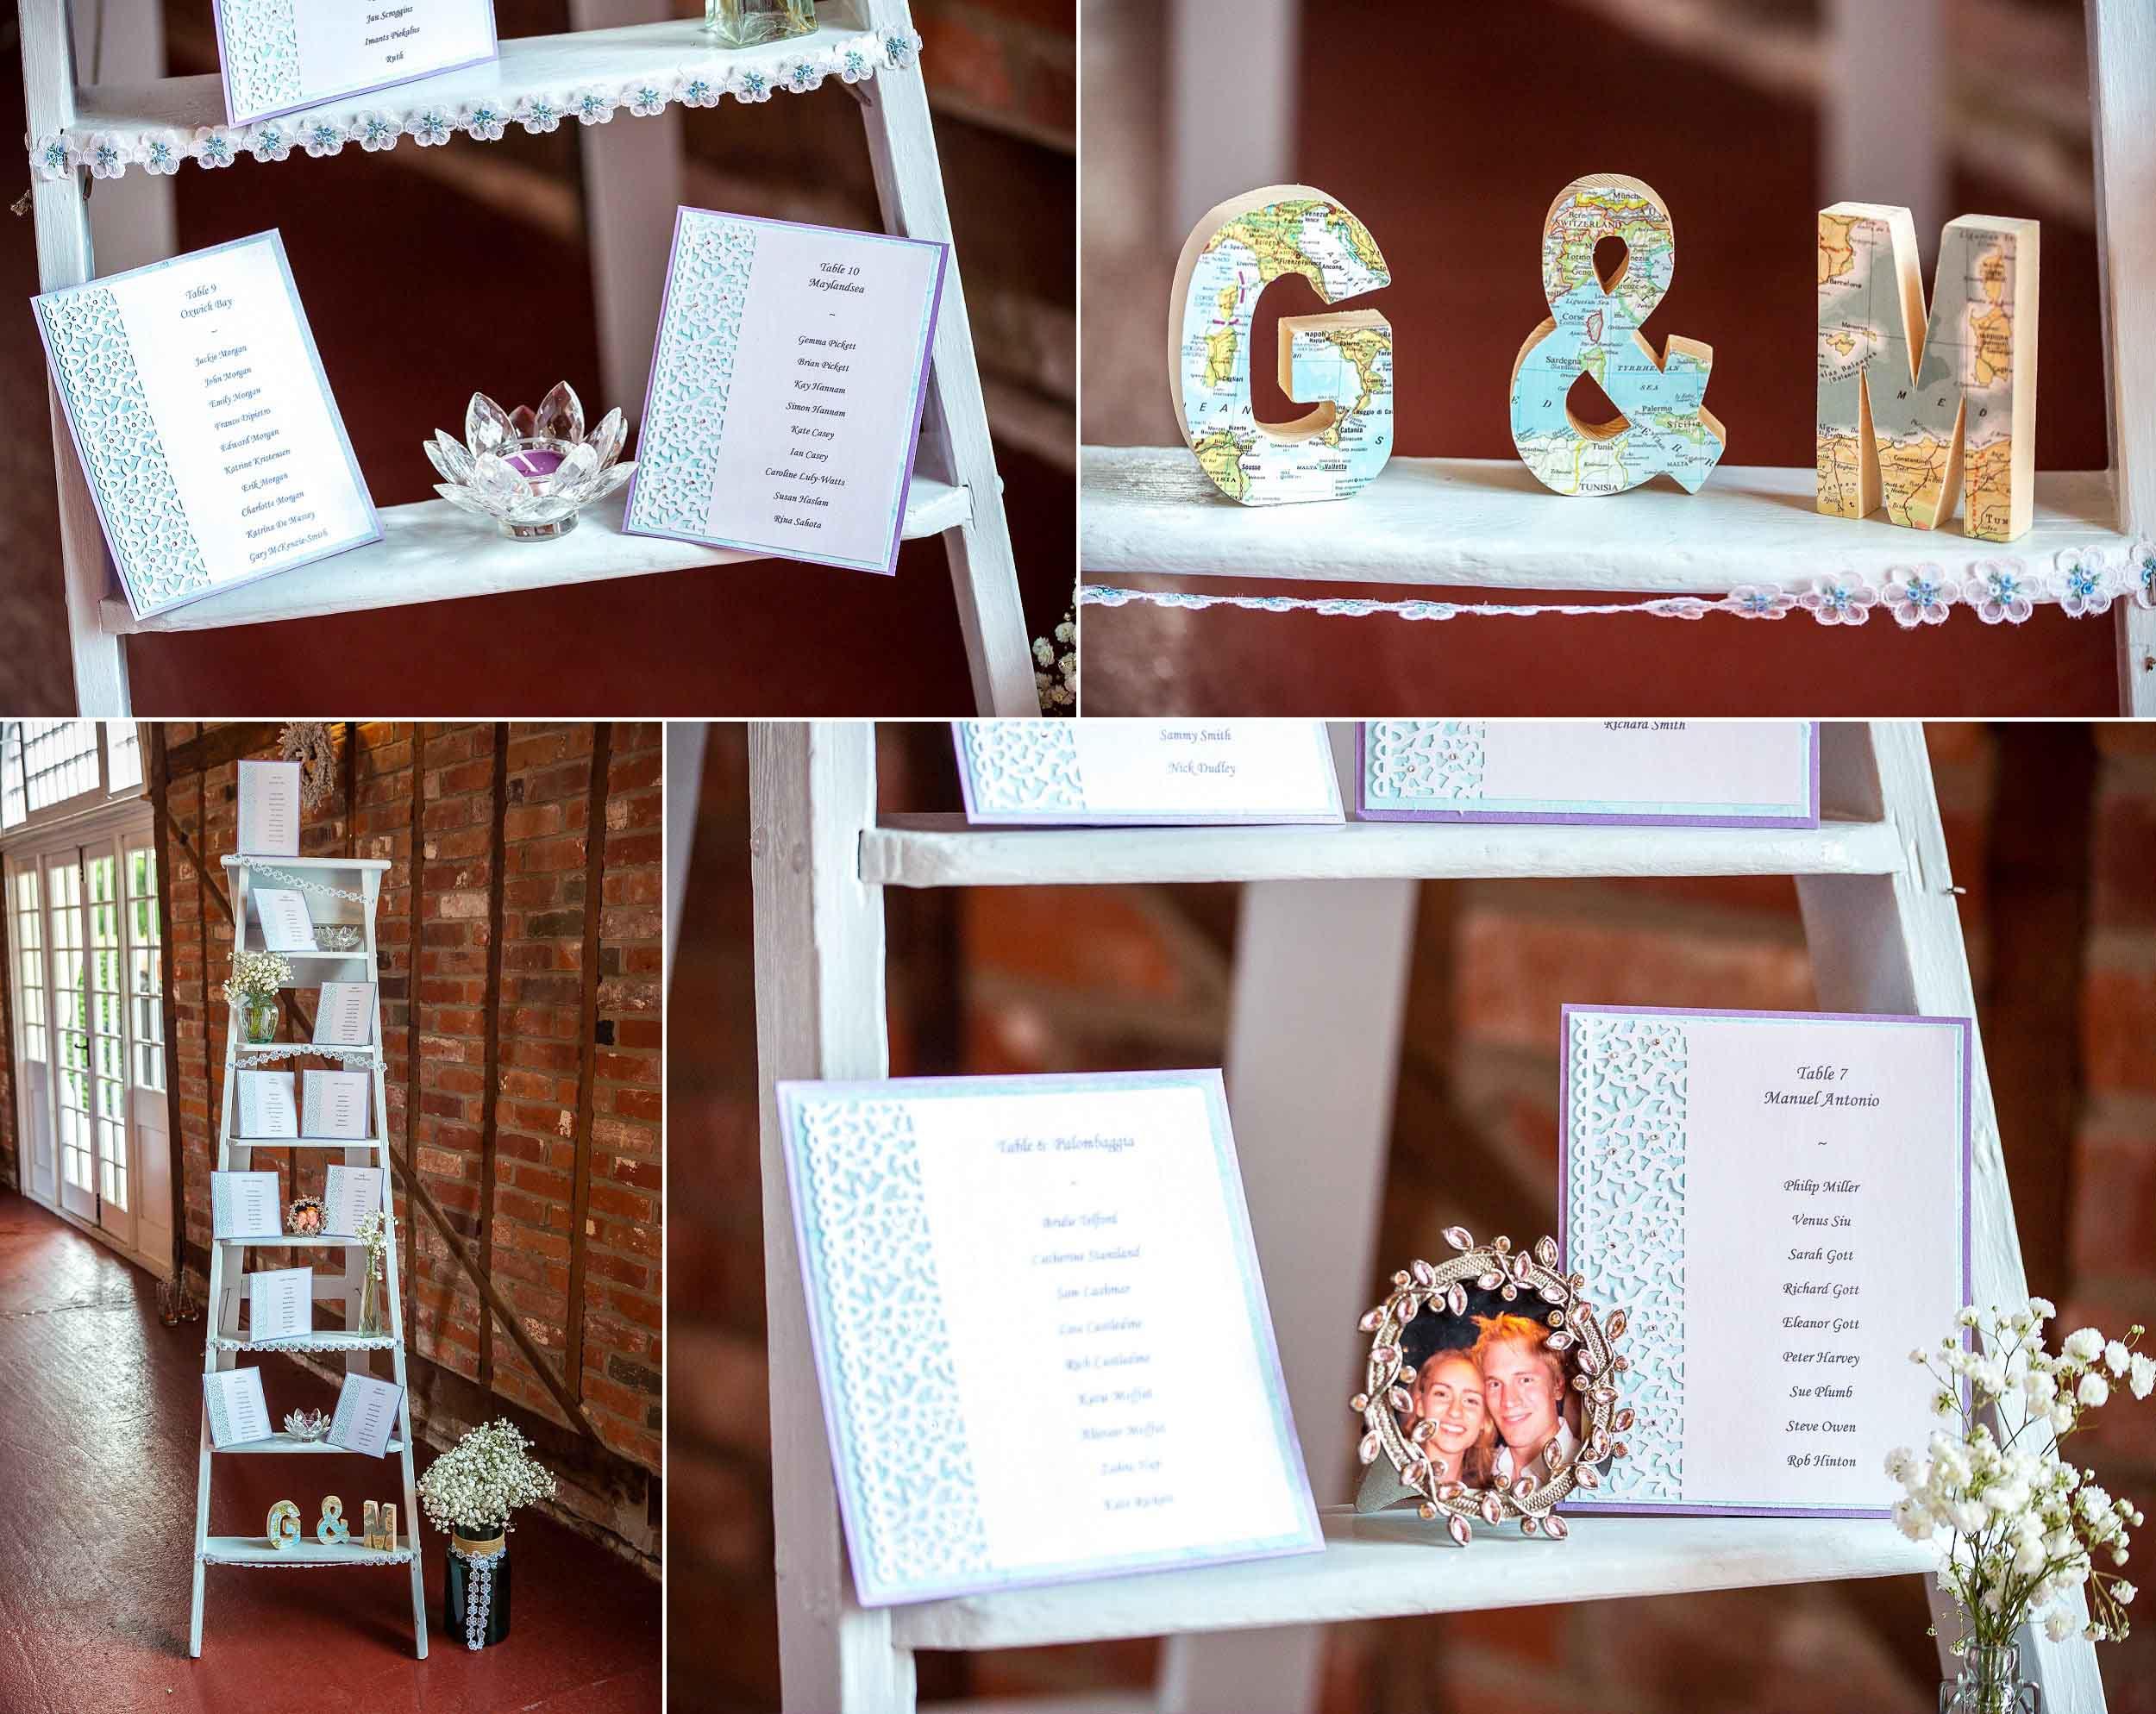 Marks-Hall-Wedding-Photographer-52.jpg